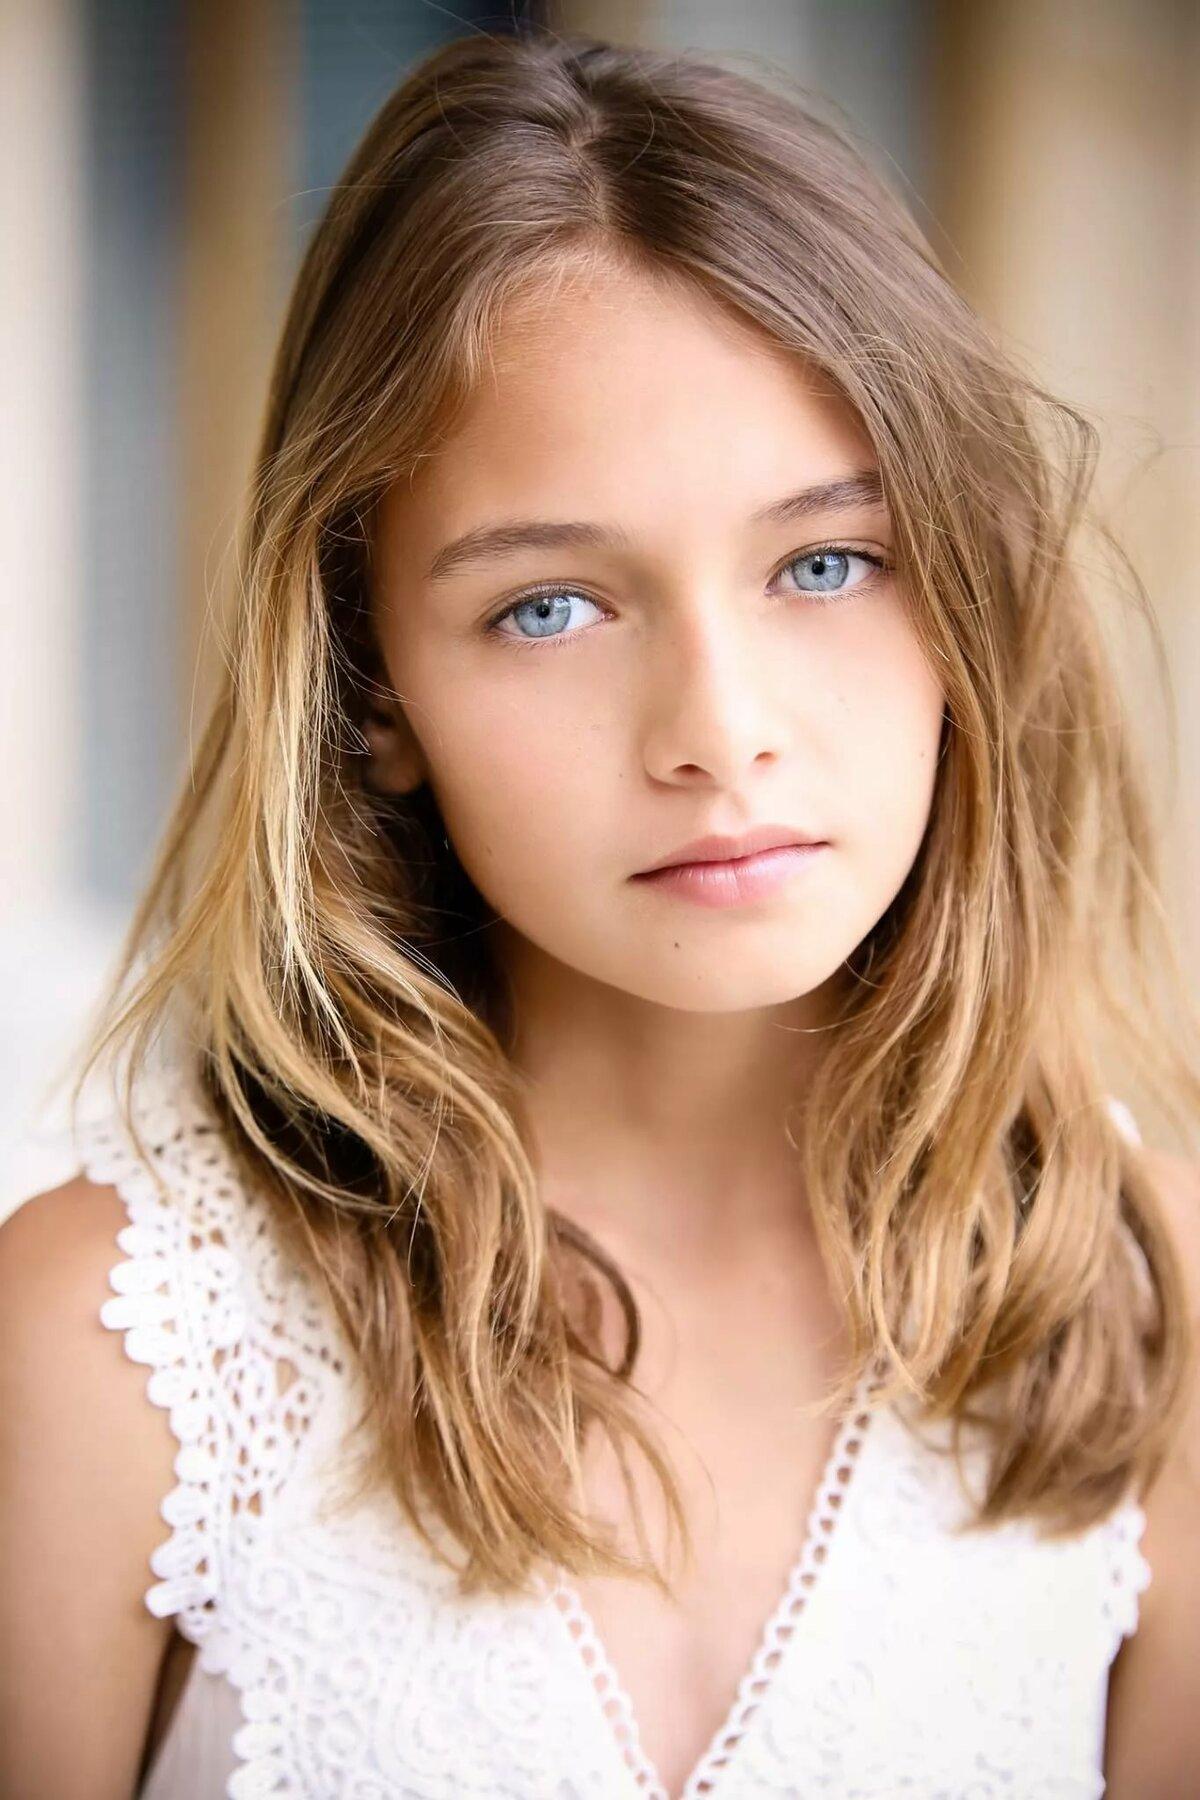 Petite modelling teenage